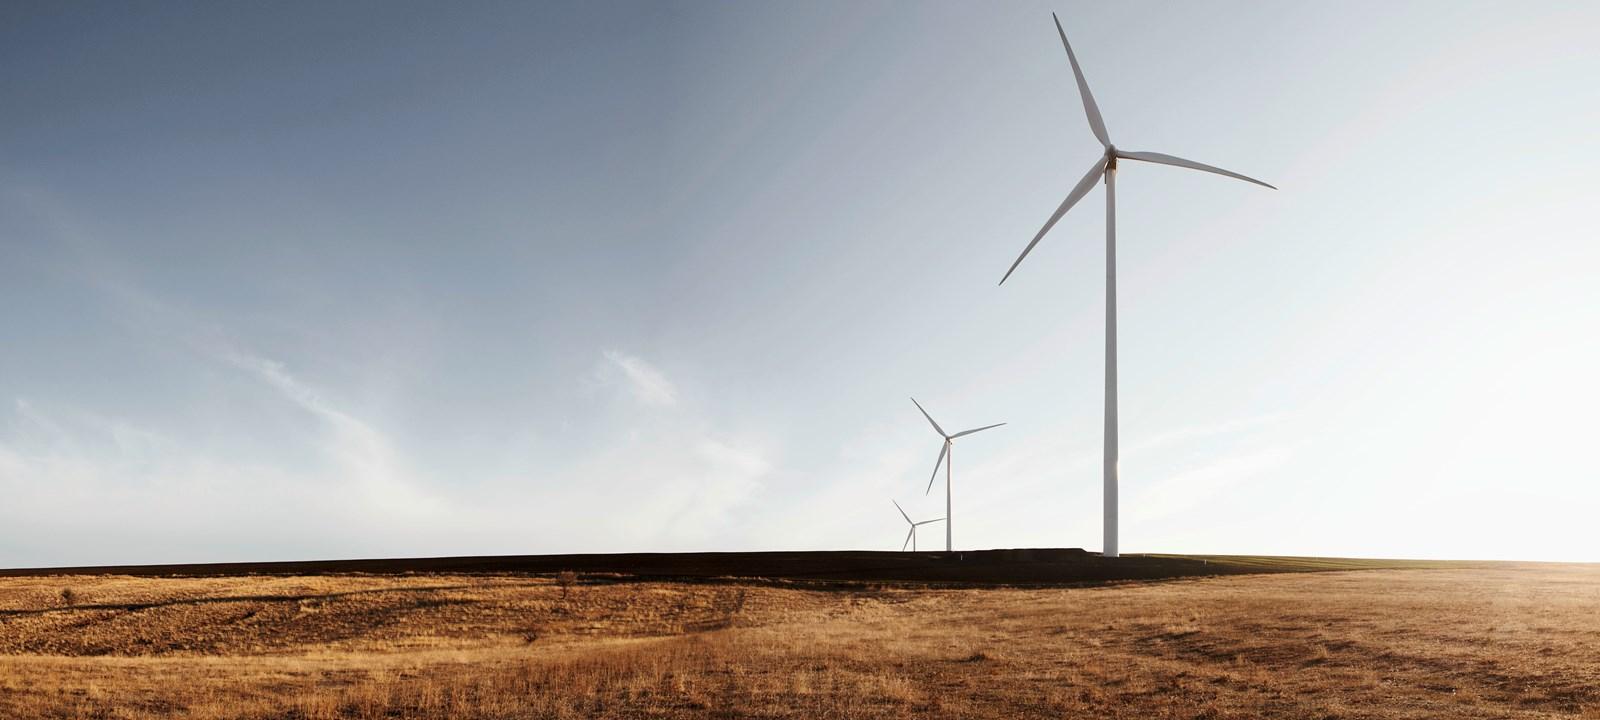 (Crédit : Global Wind Power)